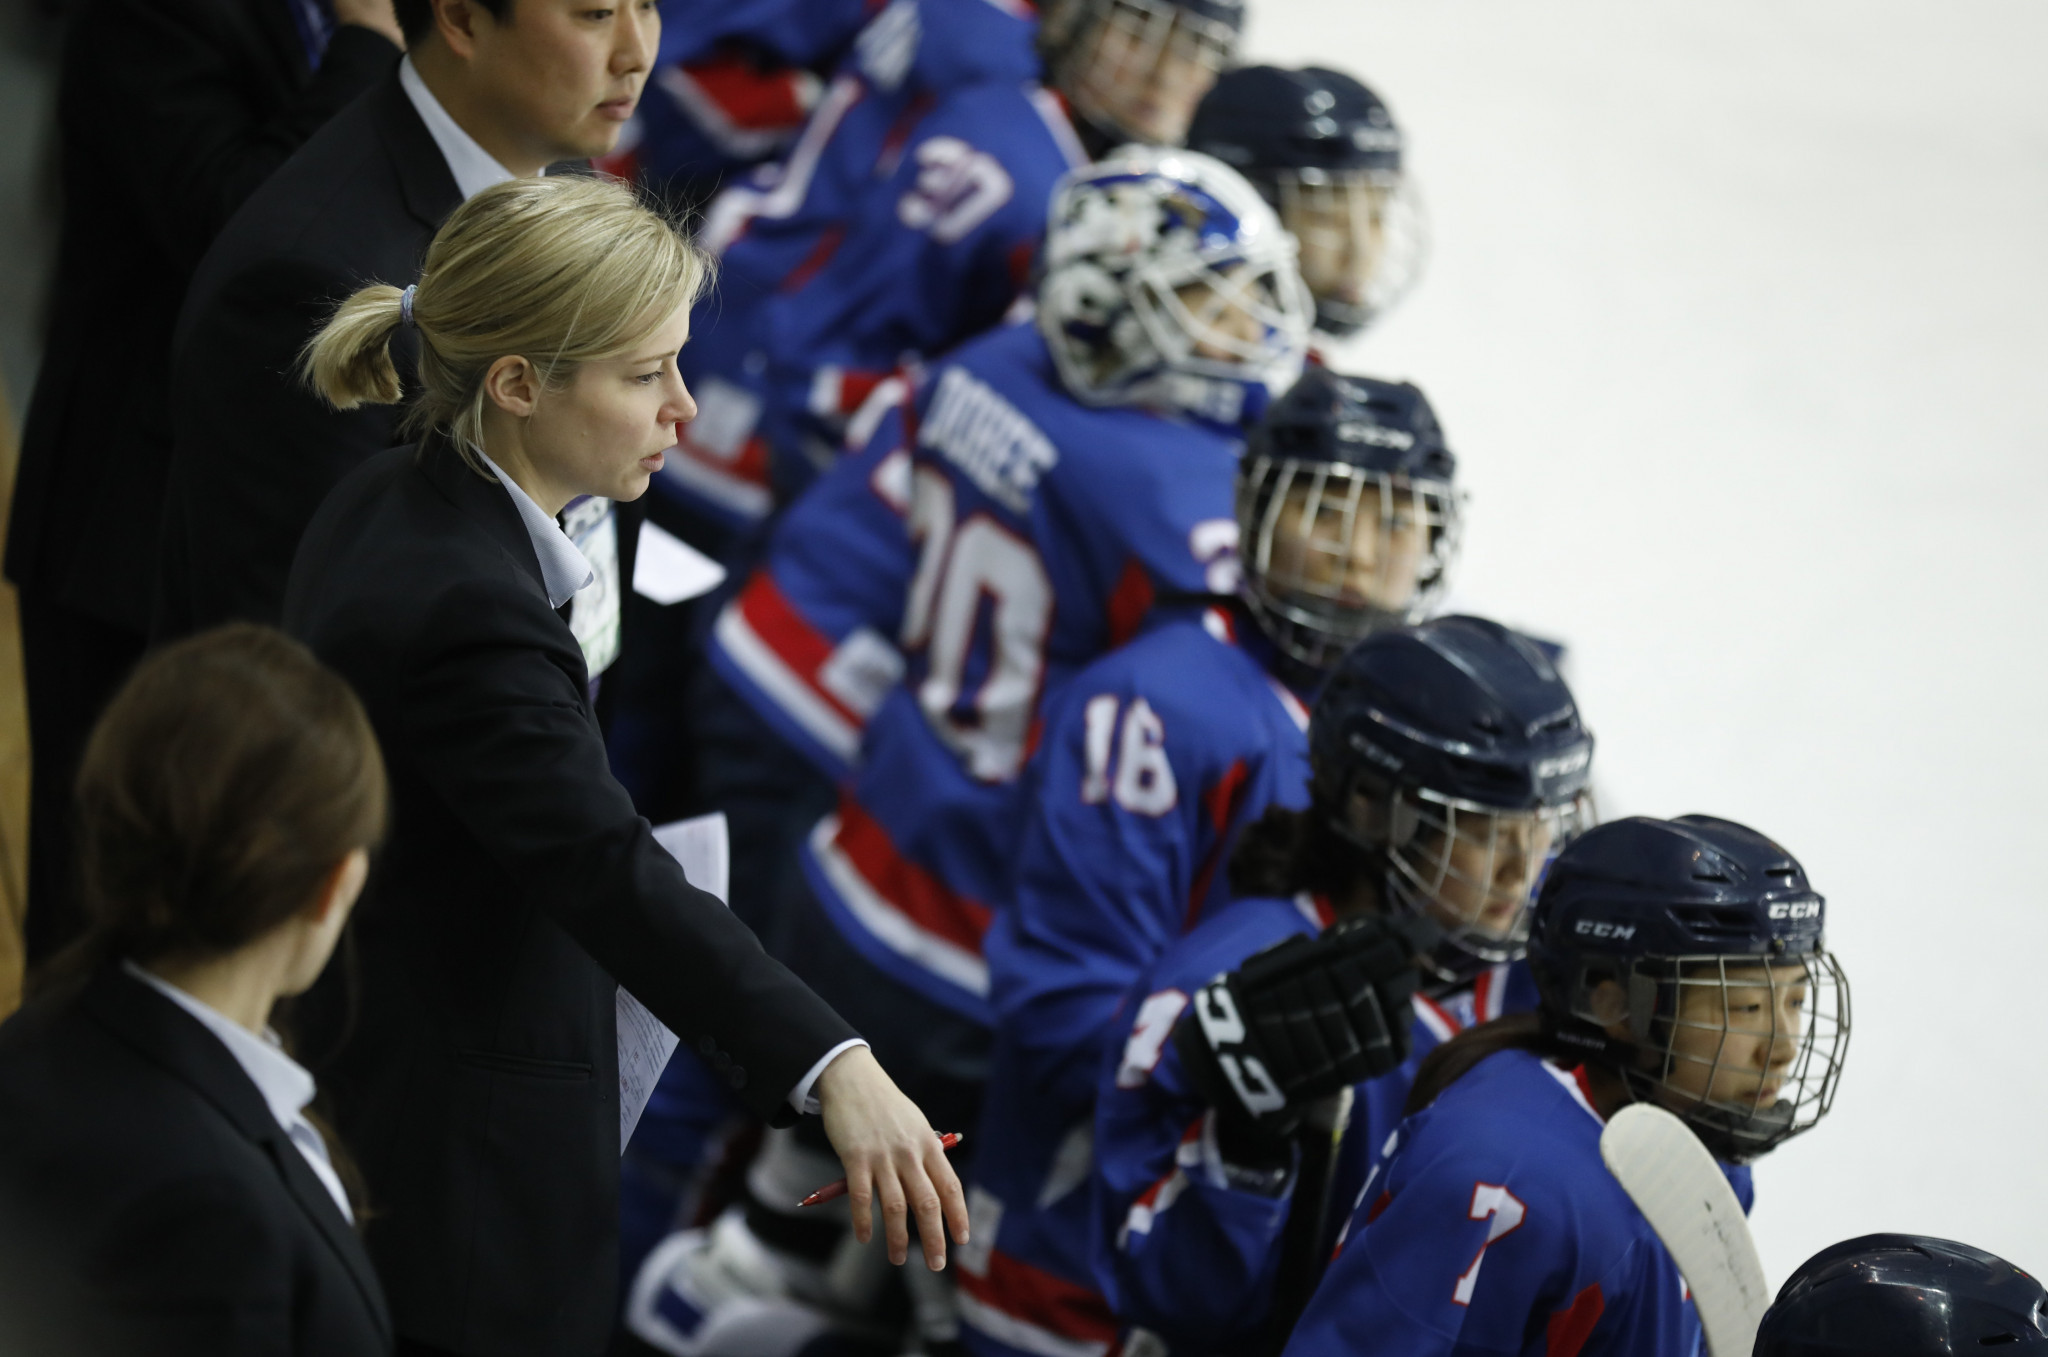 Korean ice hockey coach praises chemistry of unified team